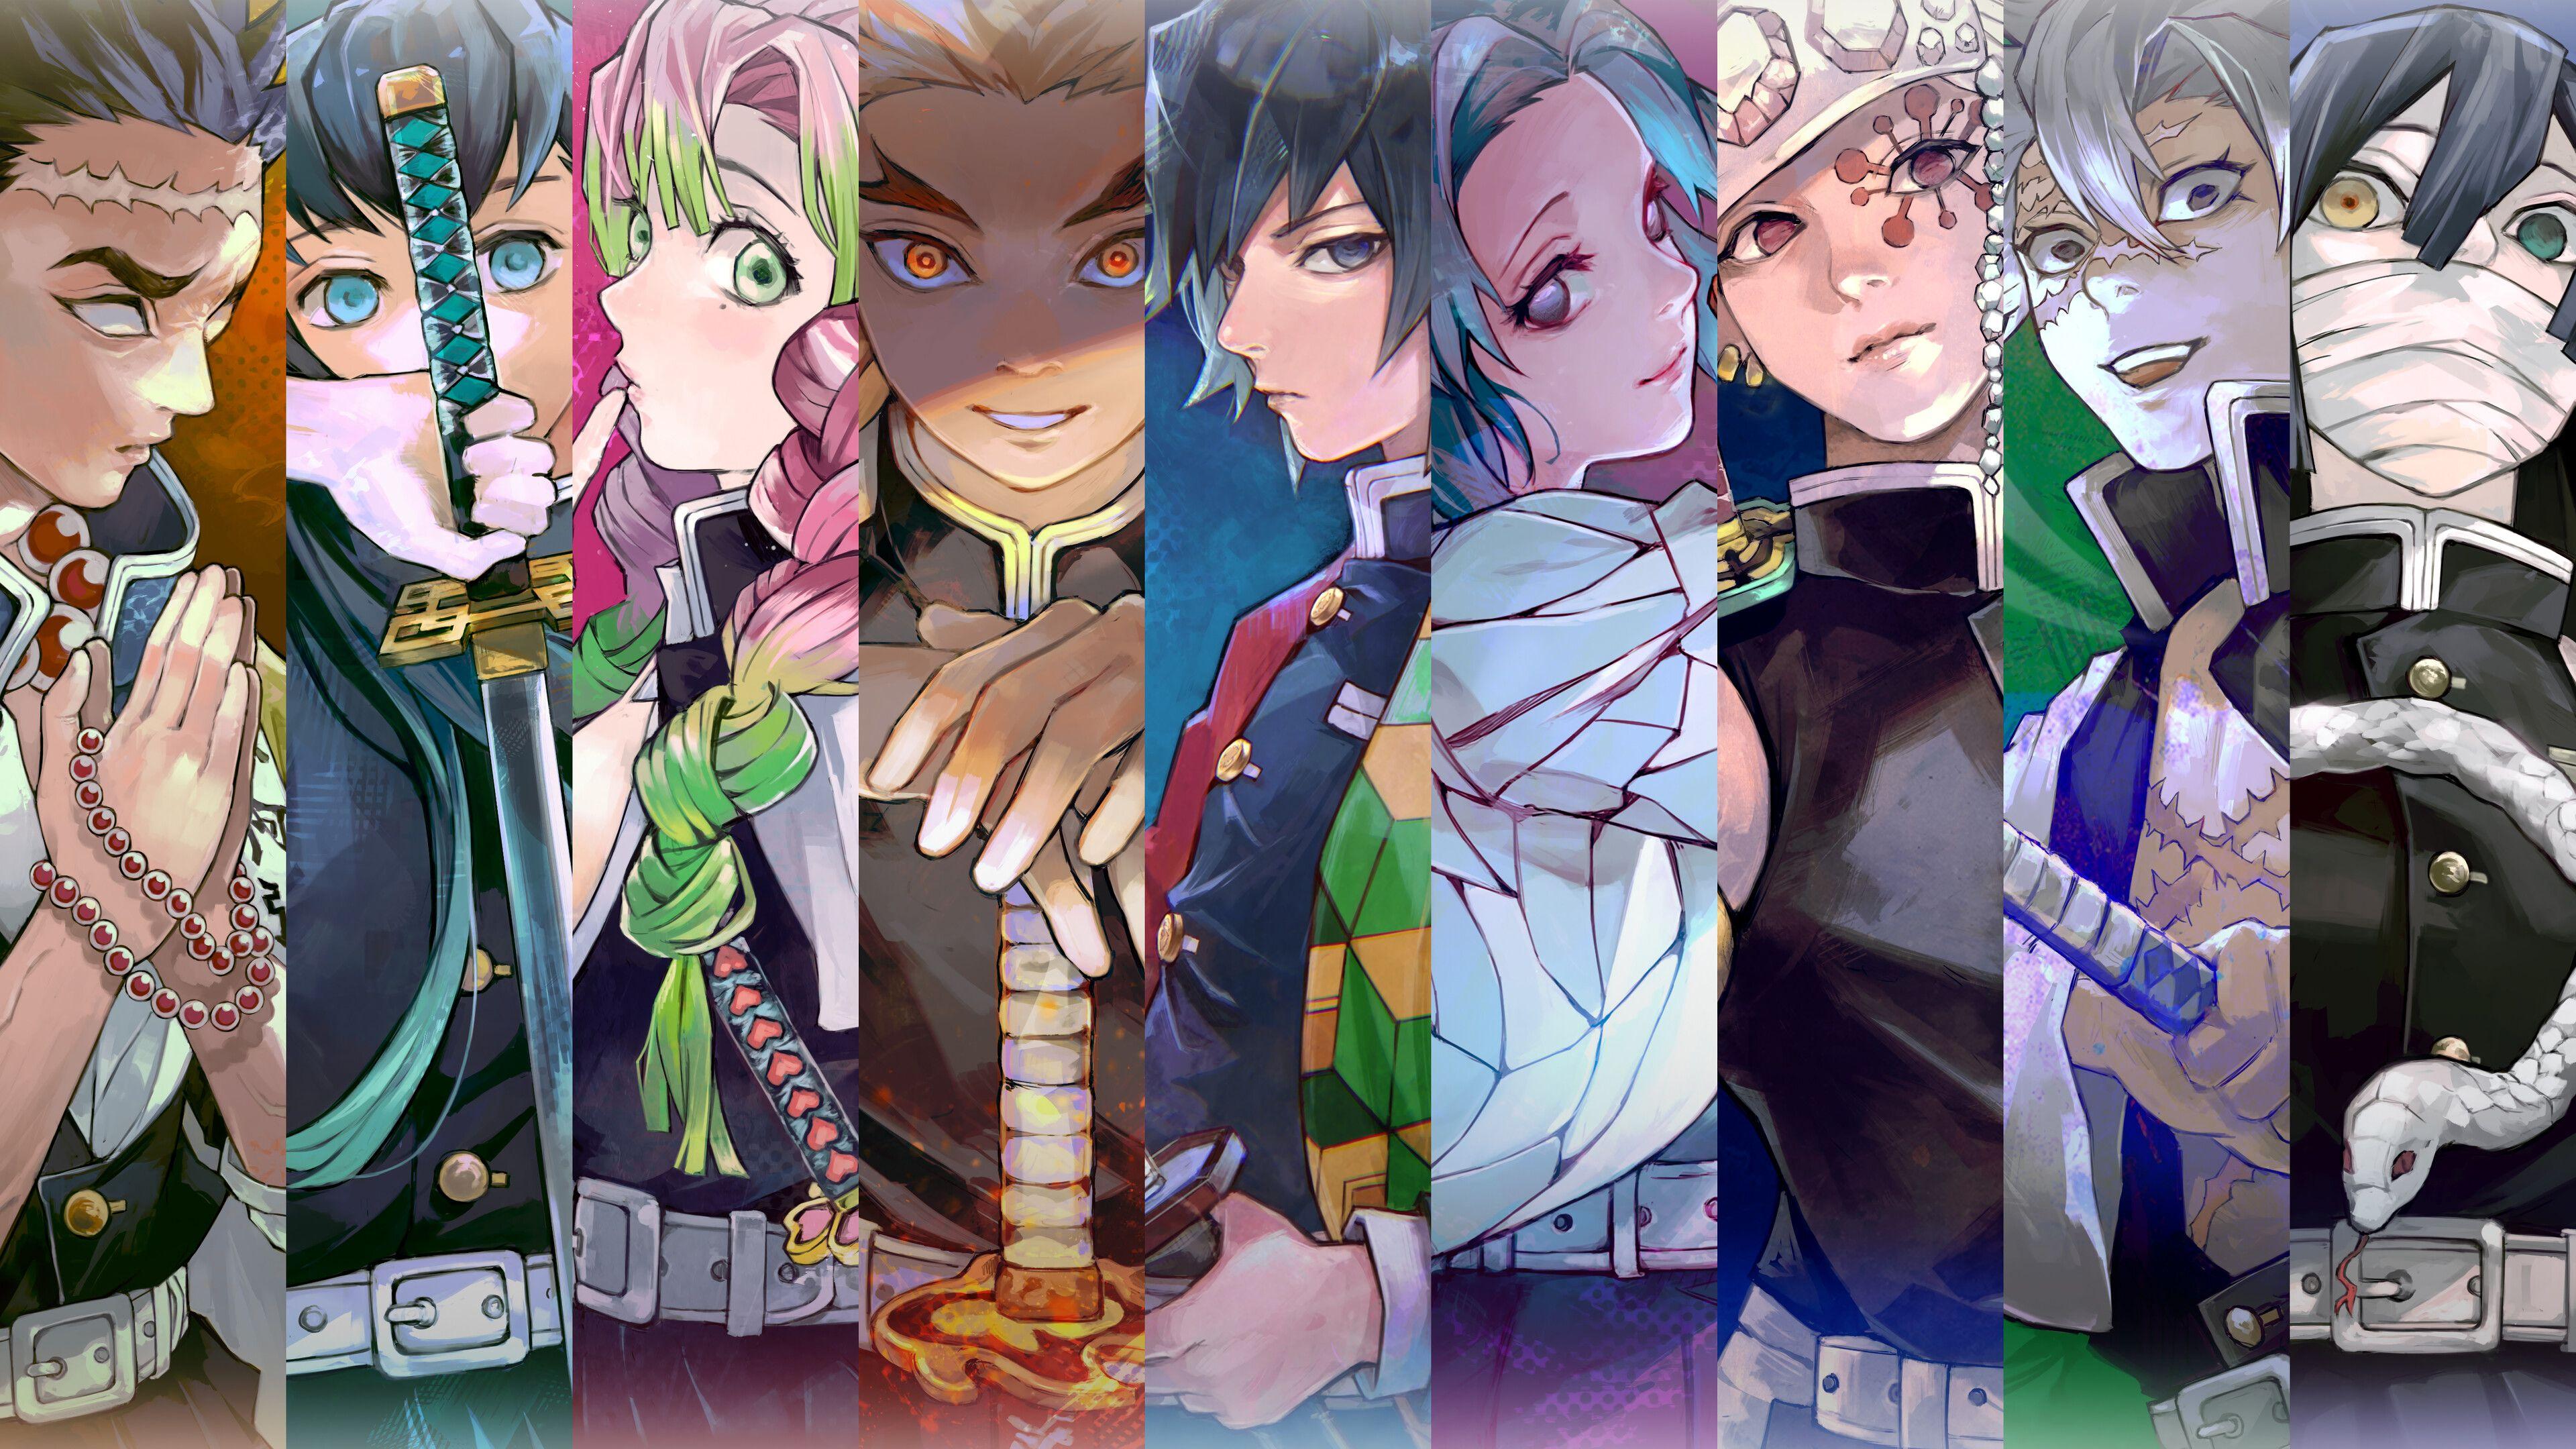 They are powerful warriors who aim to eradicate all demons in order to protect humanity. Kimetsu No Yaiba Pillars Demon Slayer Hashira - Manga